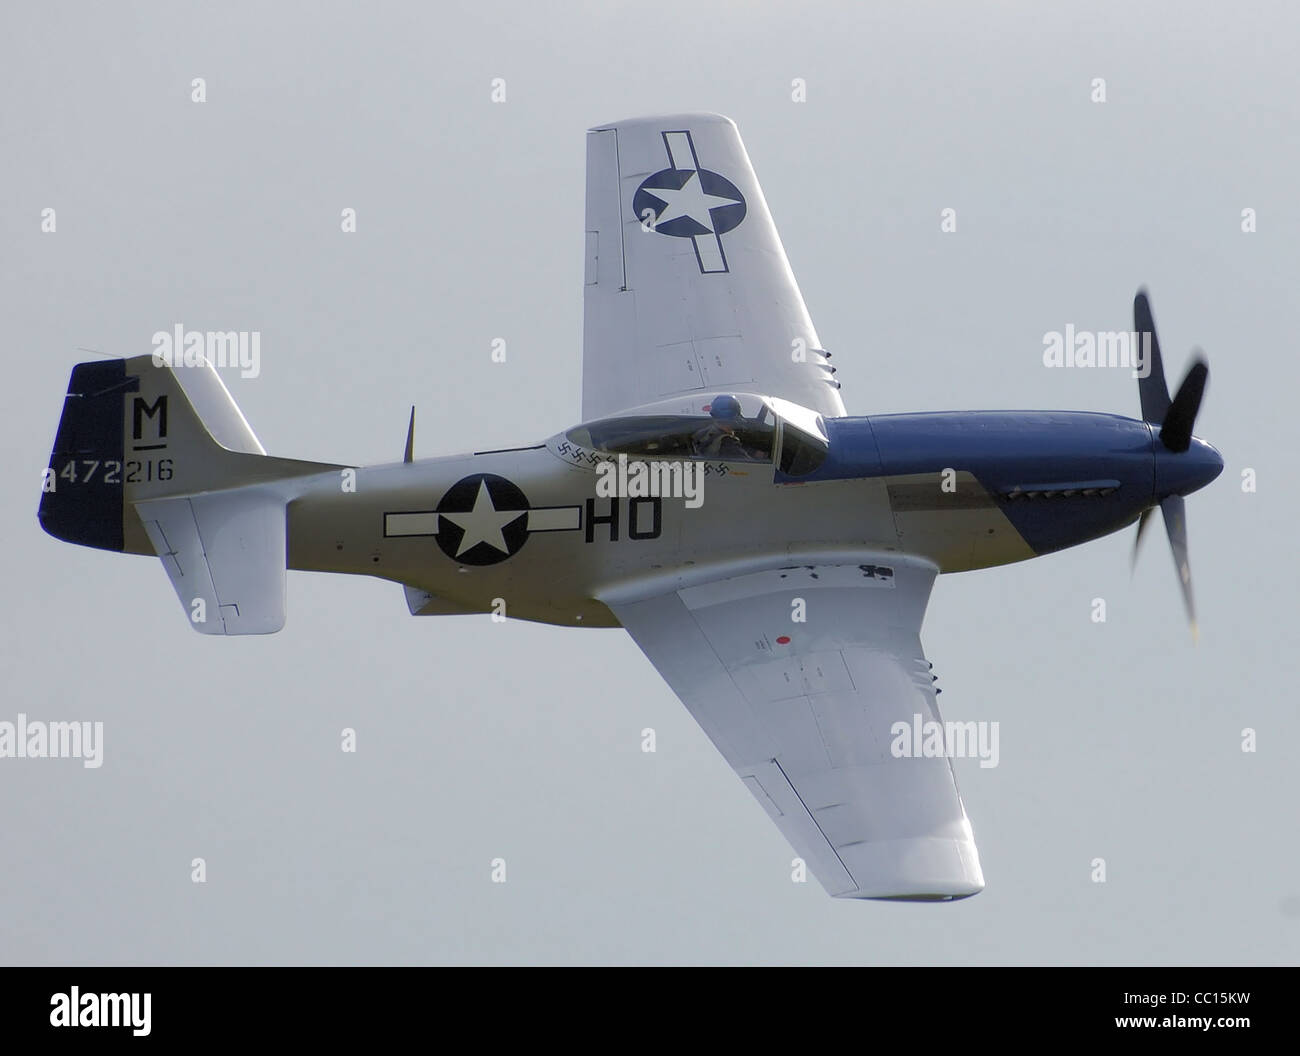 North American P-51D-20 (472216/HO-M, G-BIXL, Miss Helen) - Stock Image